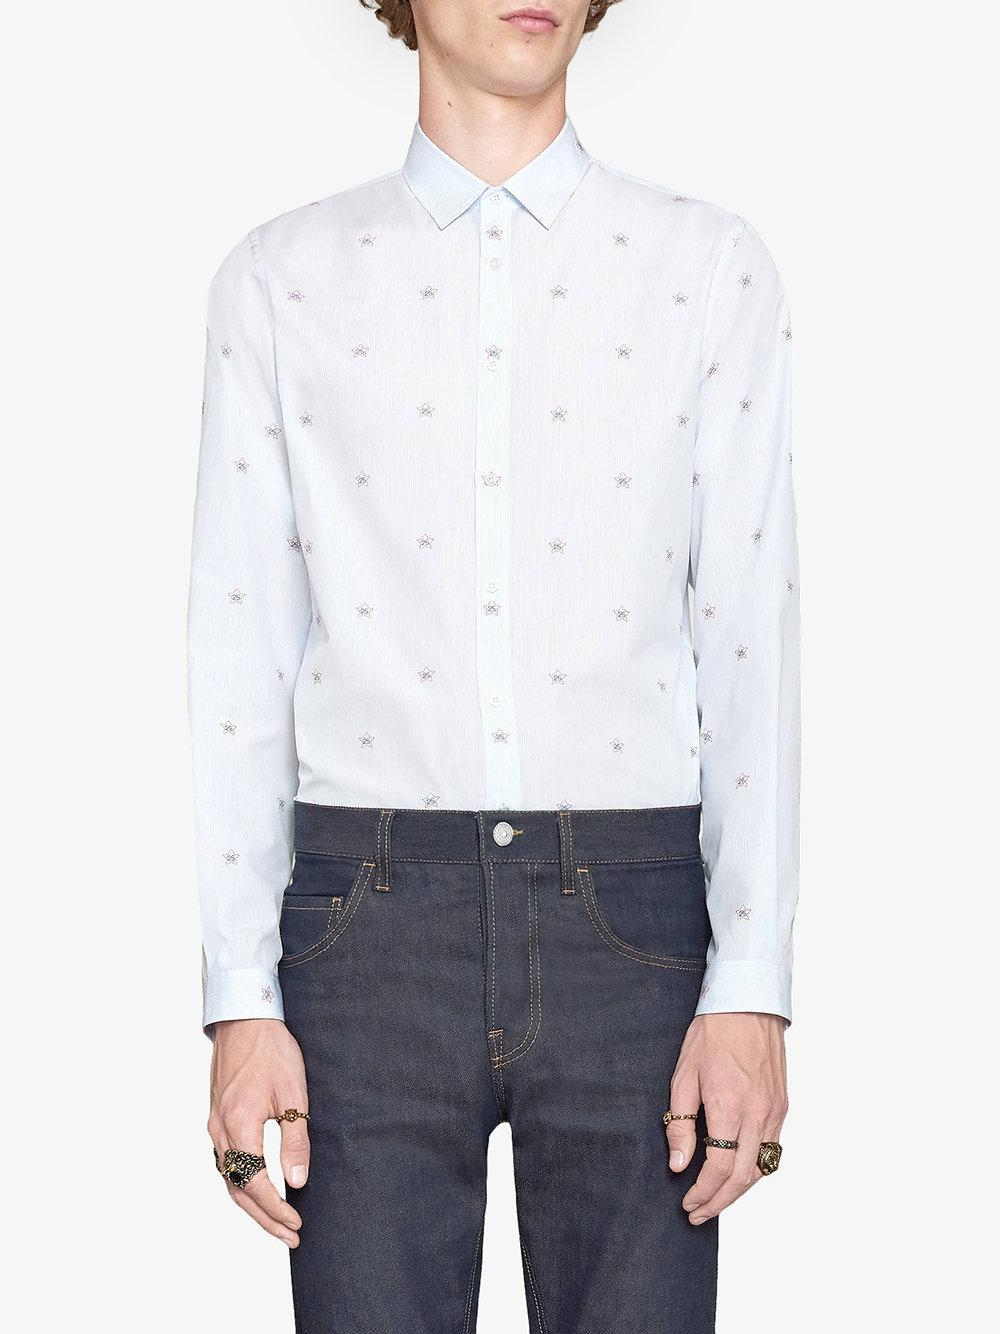 65a4858ec067 Gucci 25 Star Fil Coupé Duke Shirt in Blue for Men - Lyst